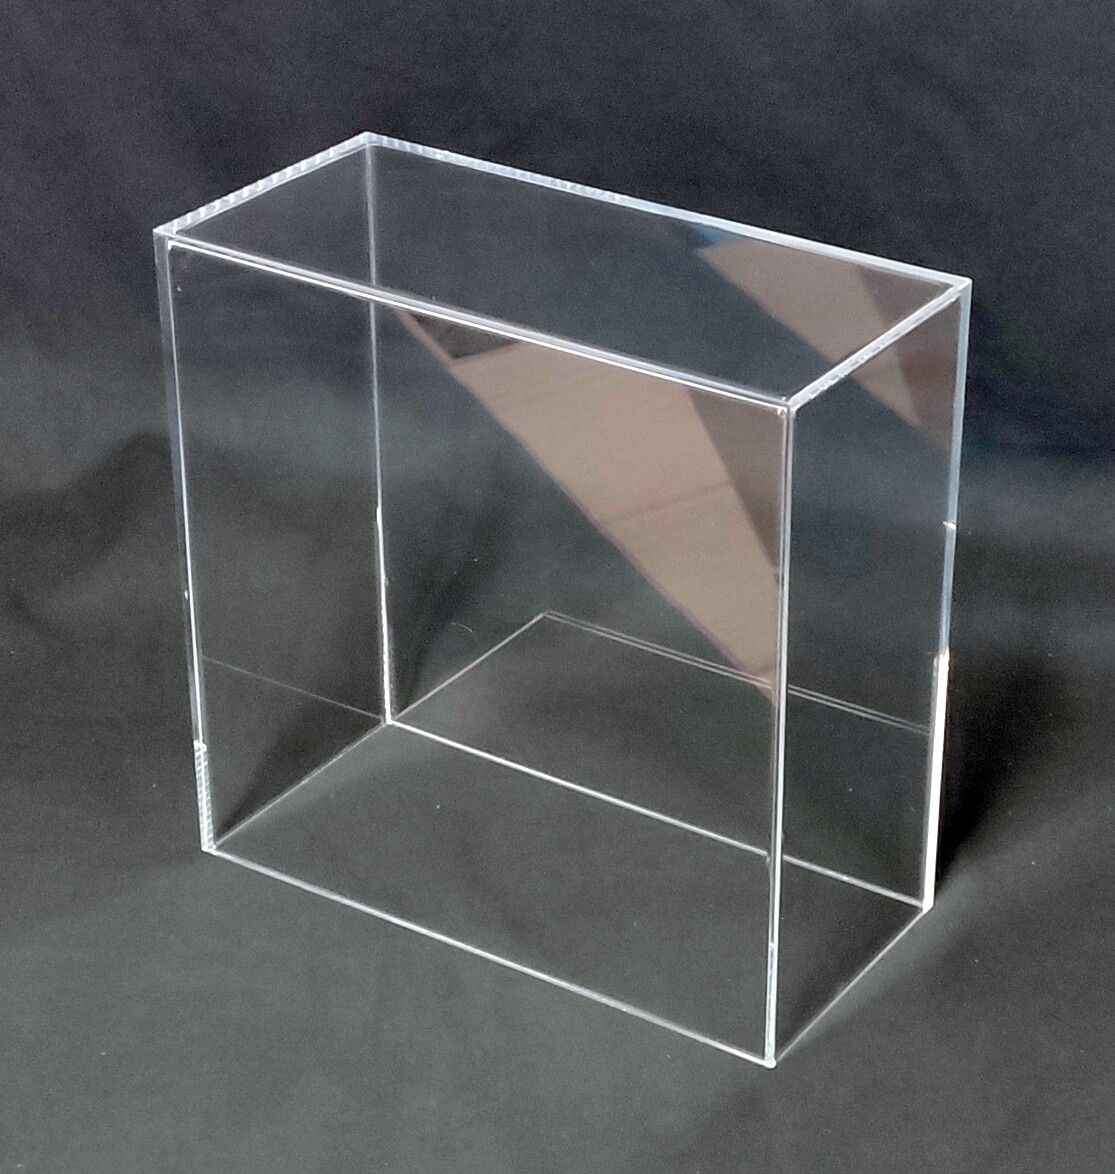 Teca - vetrinetta in plexiglass. Cm. 26,6 x 12,5 x H. 26,5